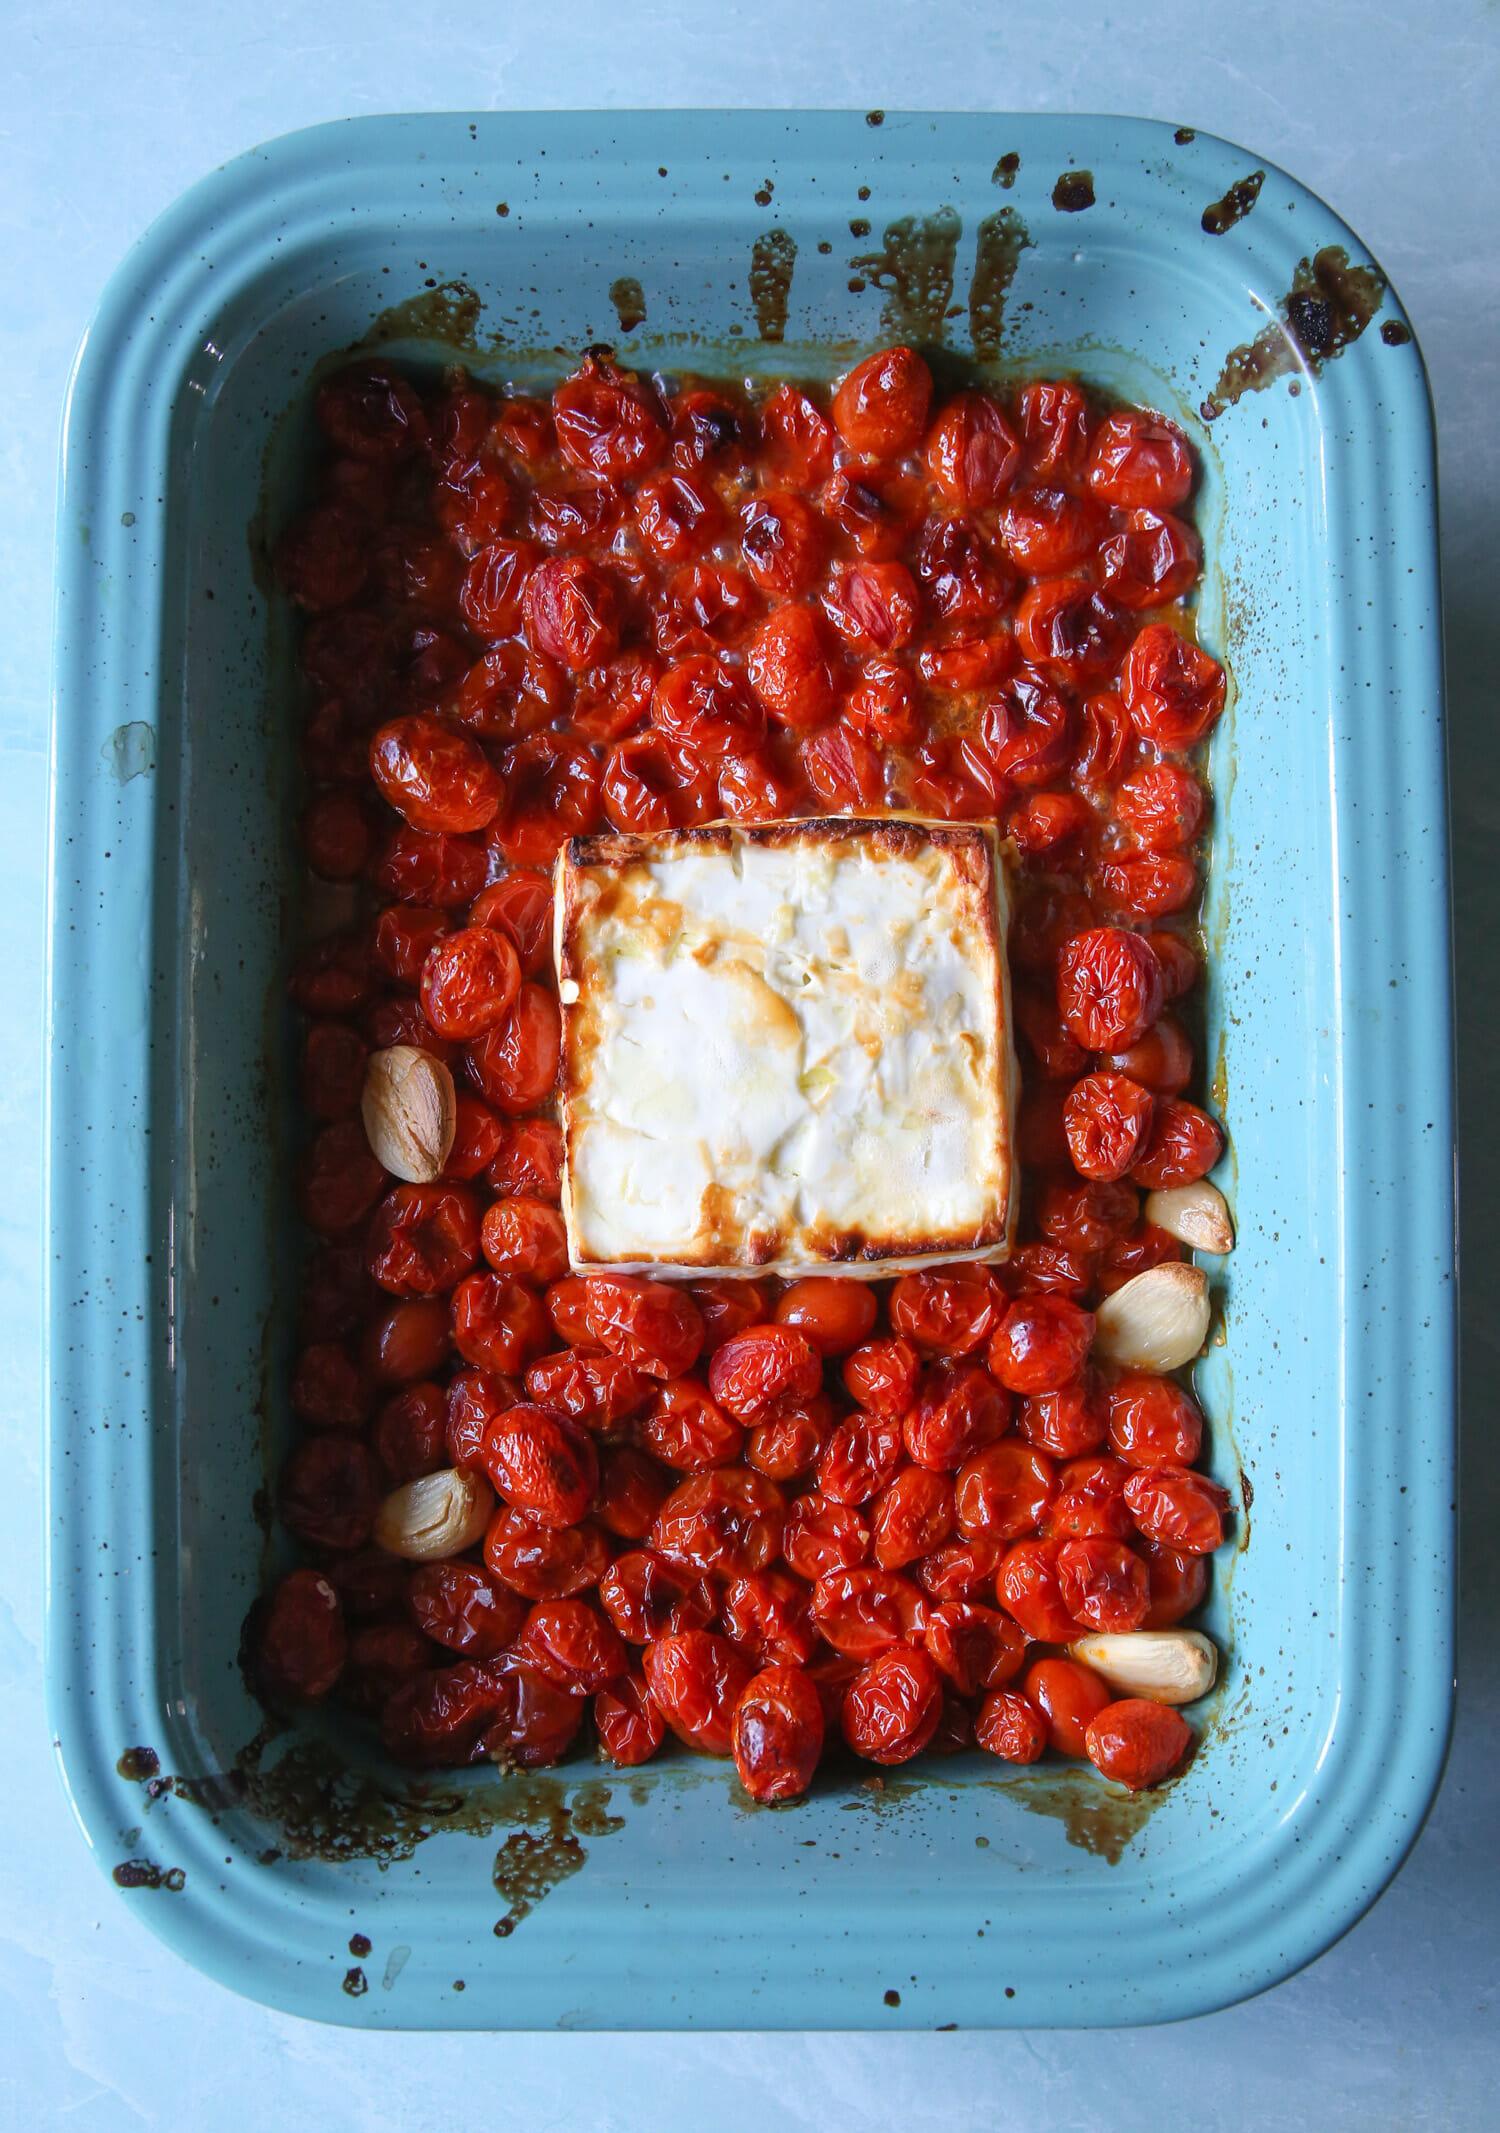 roasted tomatoes, garlic, and feta cheese